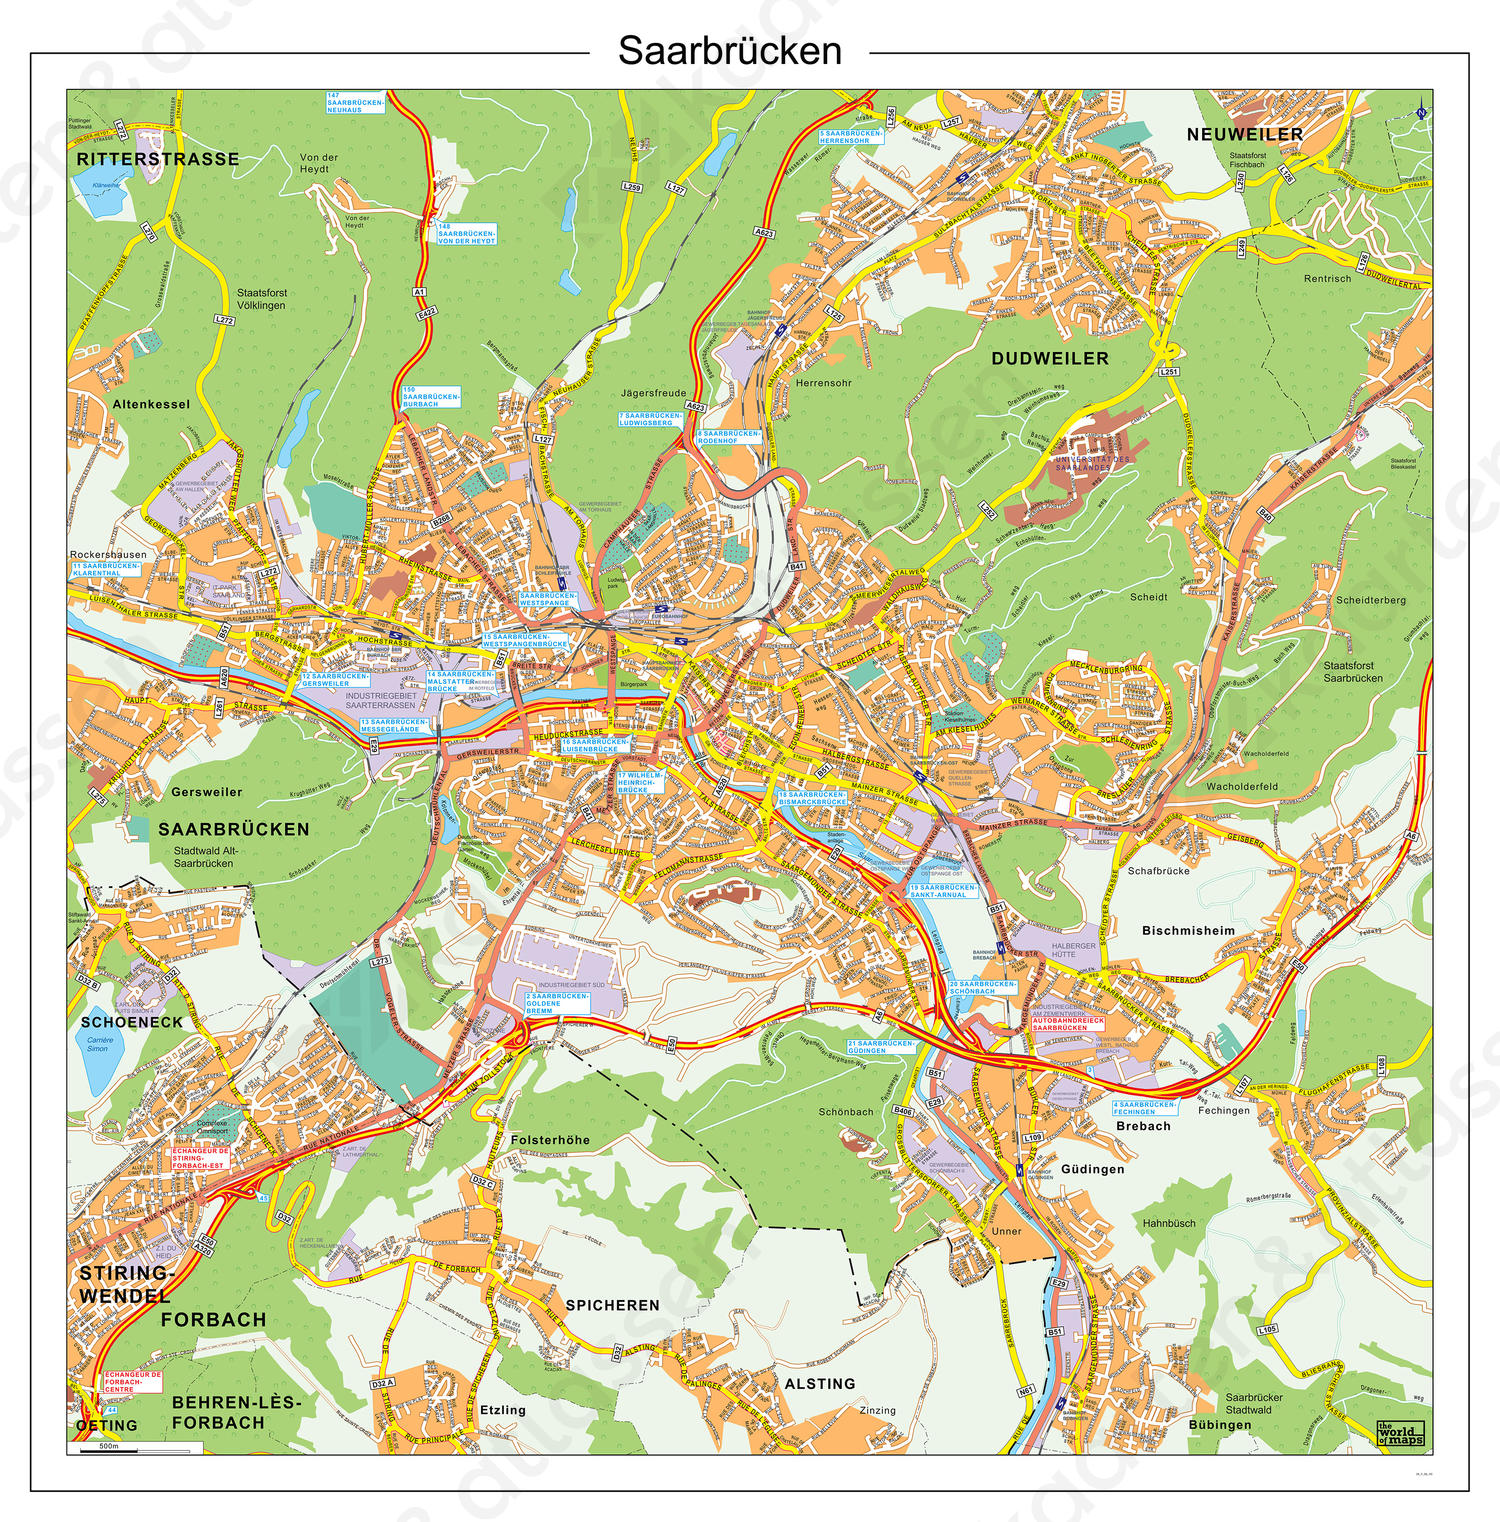 Digitale Saarbrucken / Saarbrücken 185